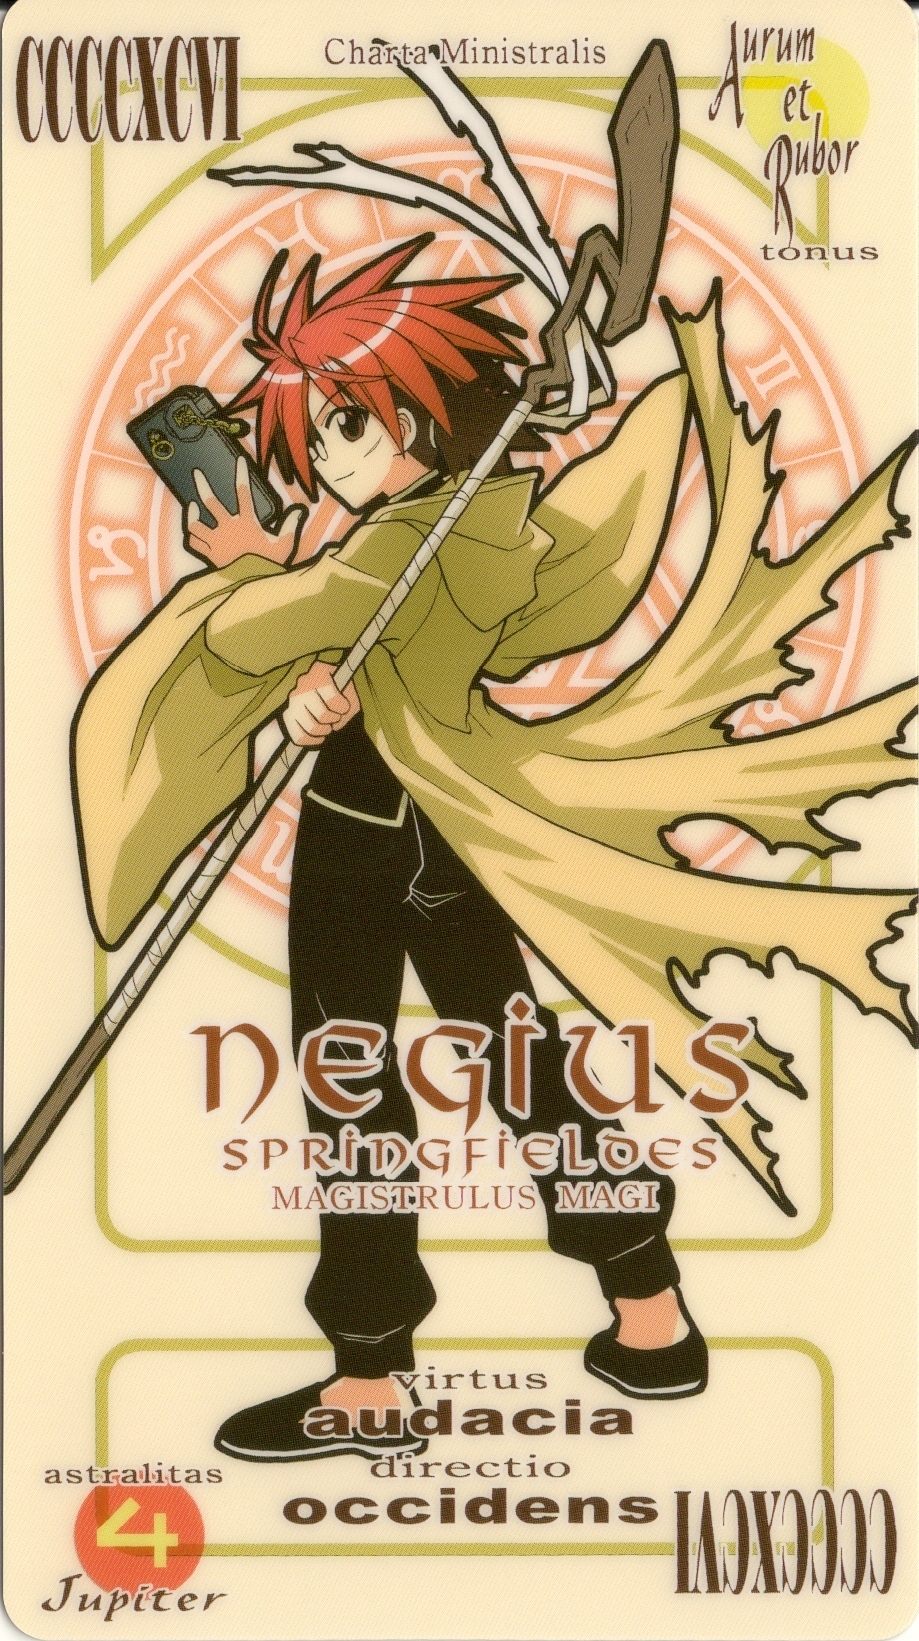 Mahou Sensei Negima Anime Crowd Leather Passport Holder Cover Case Travel One Pocket